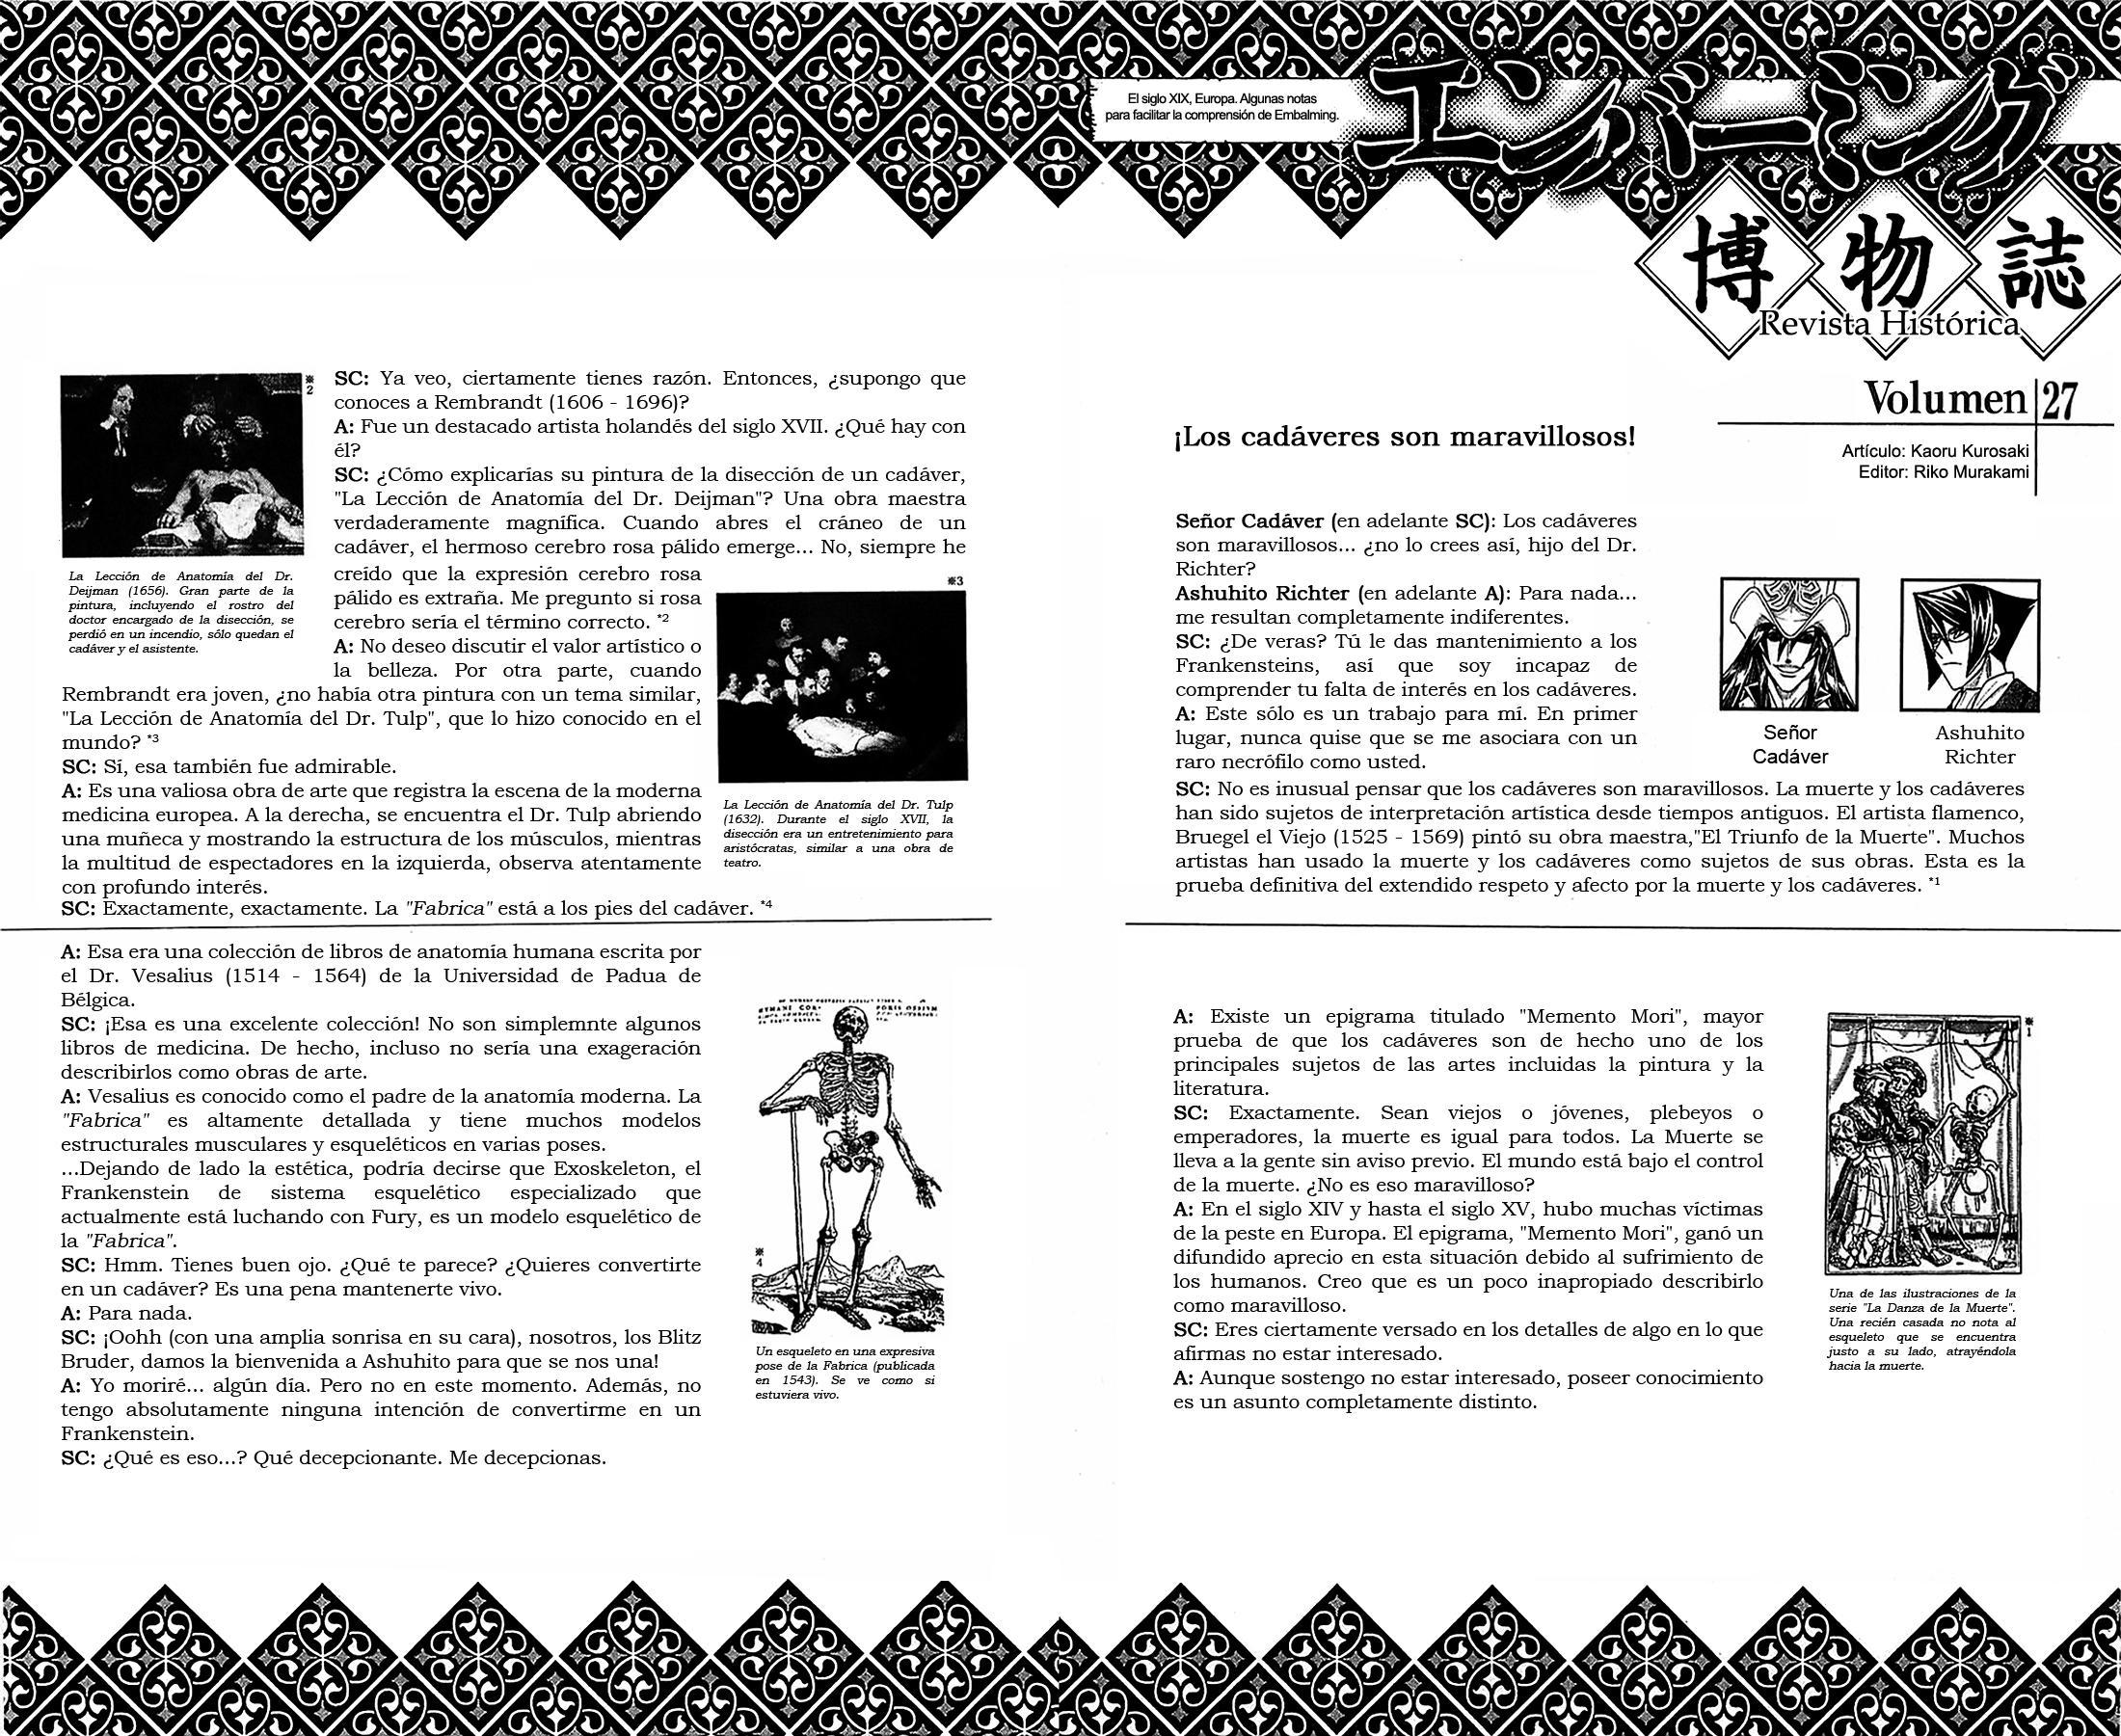 http://c5.ninemanga.com/es_manga/45/18797/447916/1a551b7323fefa14d9b4ac09bd73ee49.jpg Page 31